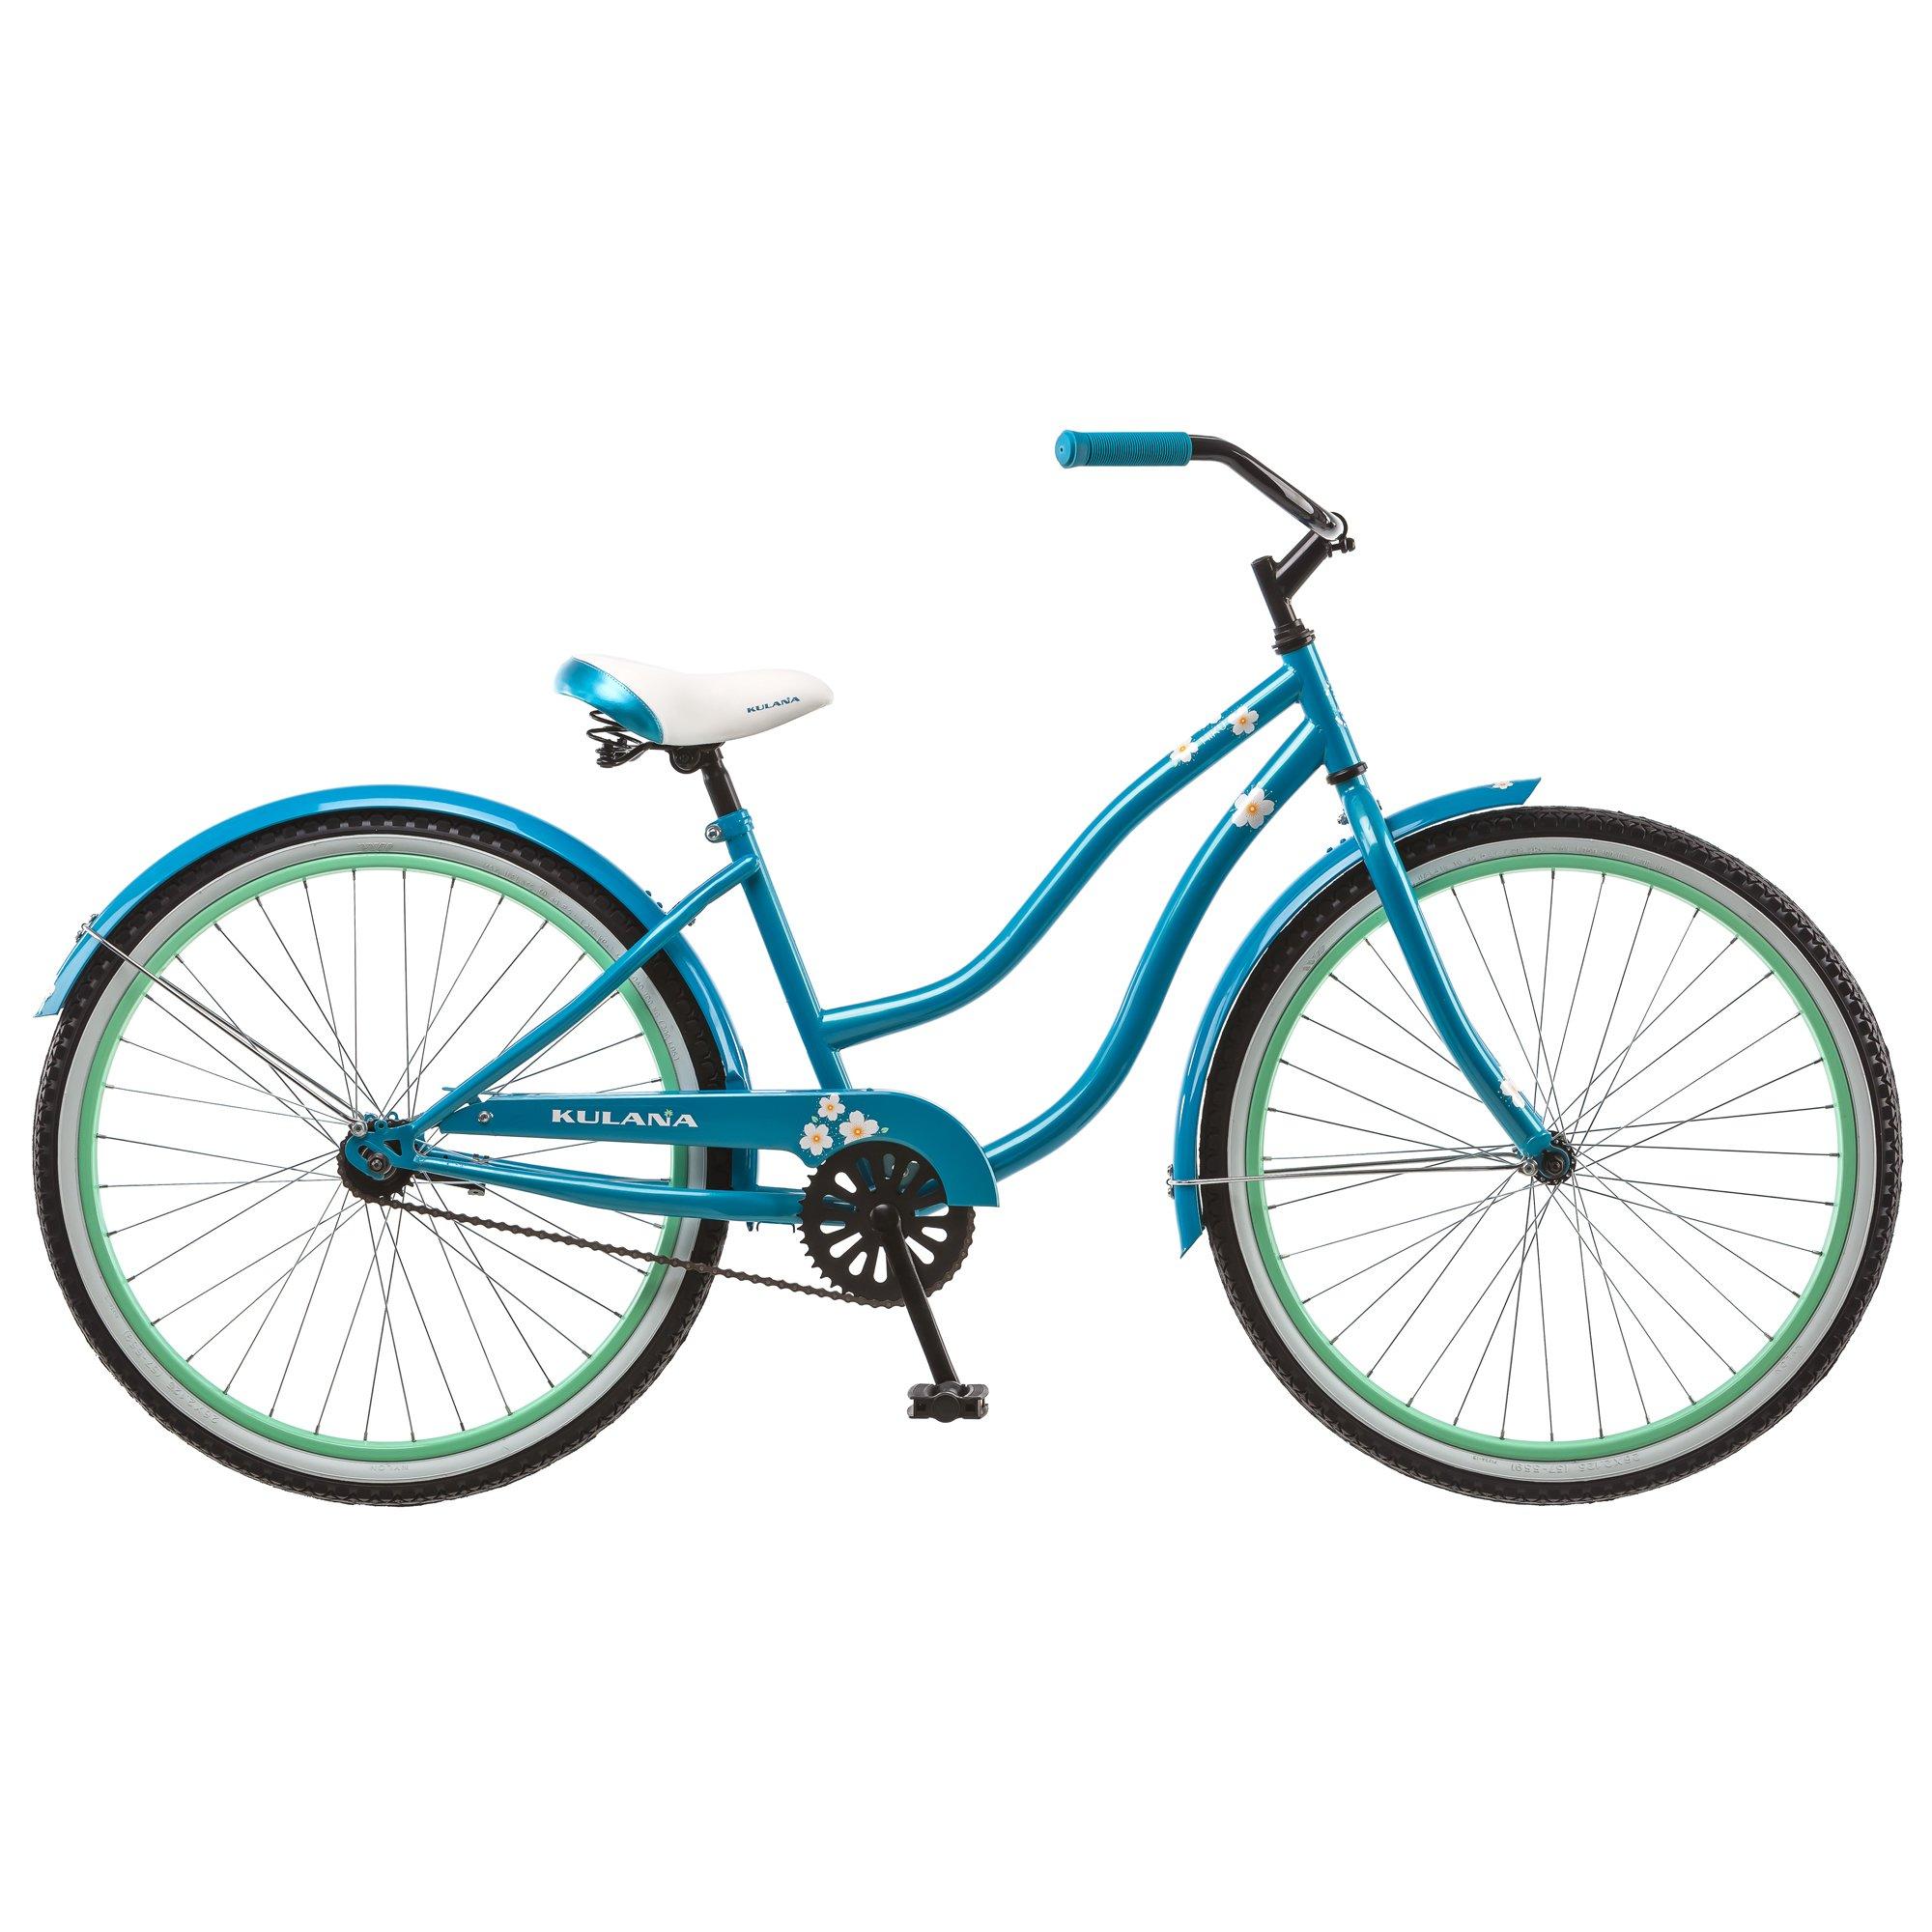 Kulana Women's Cruiser Bike, 26-Inch, Blue